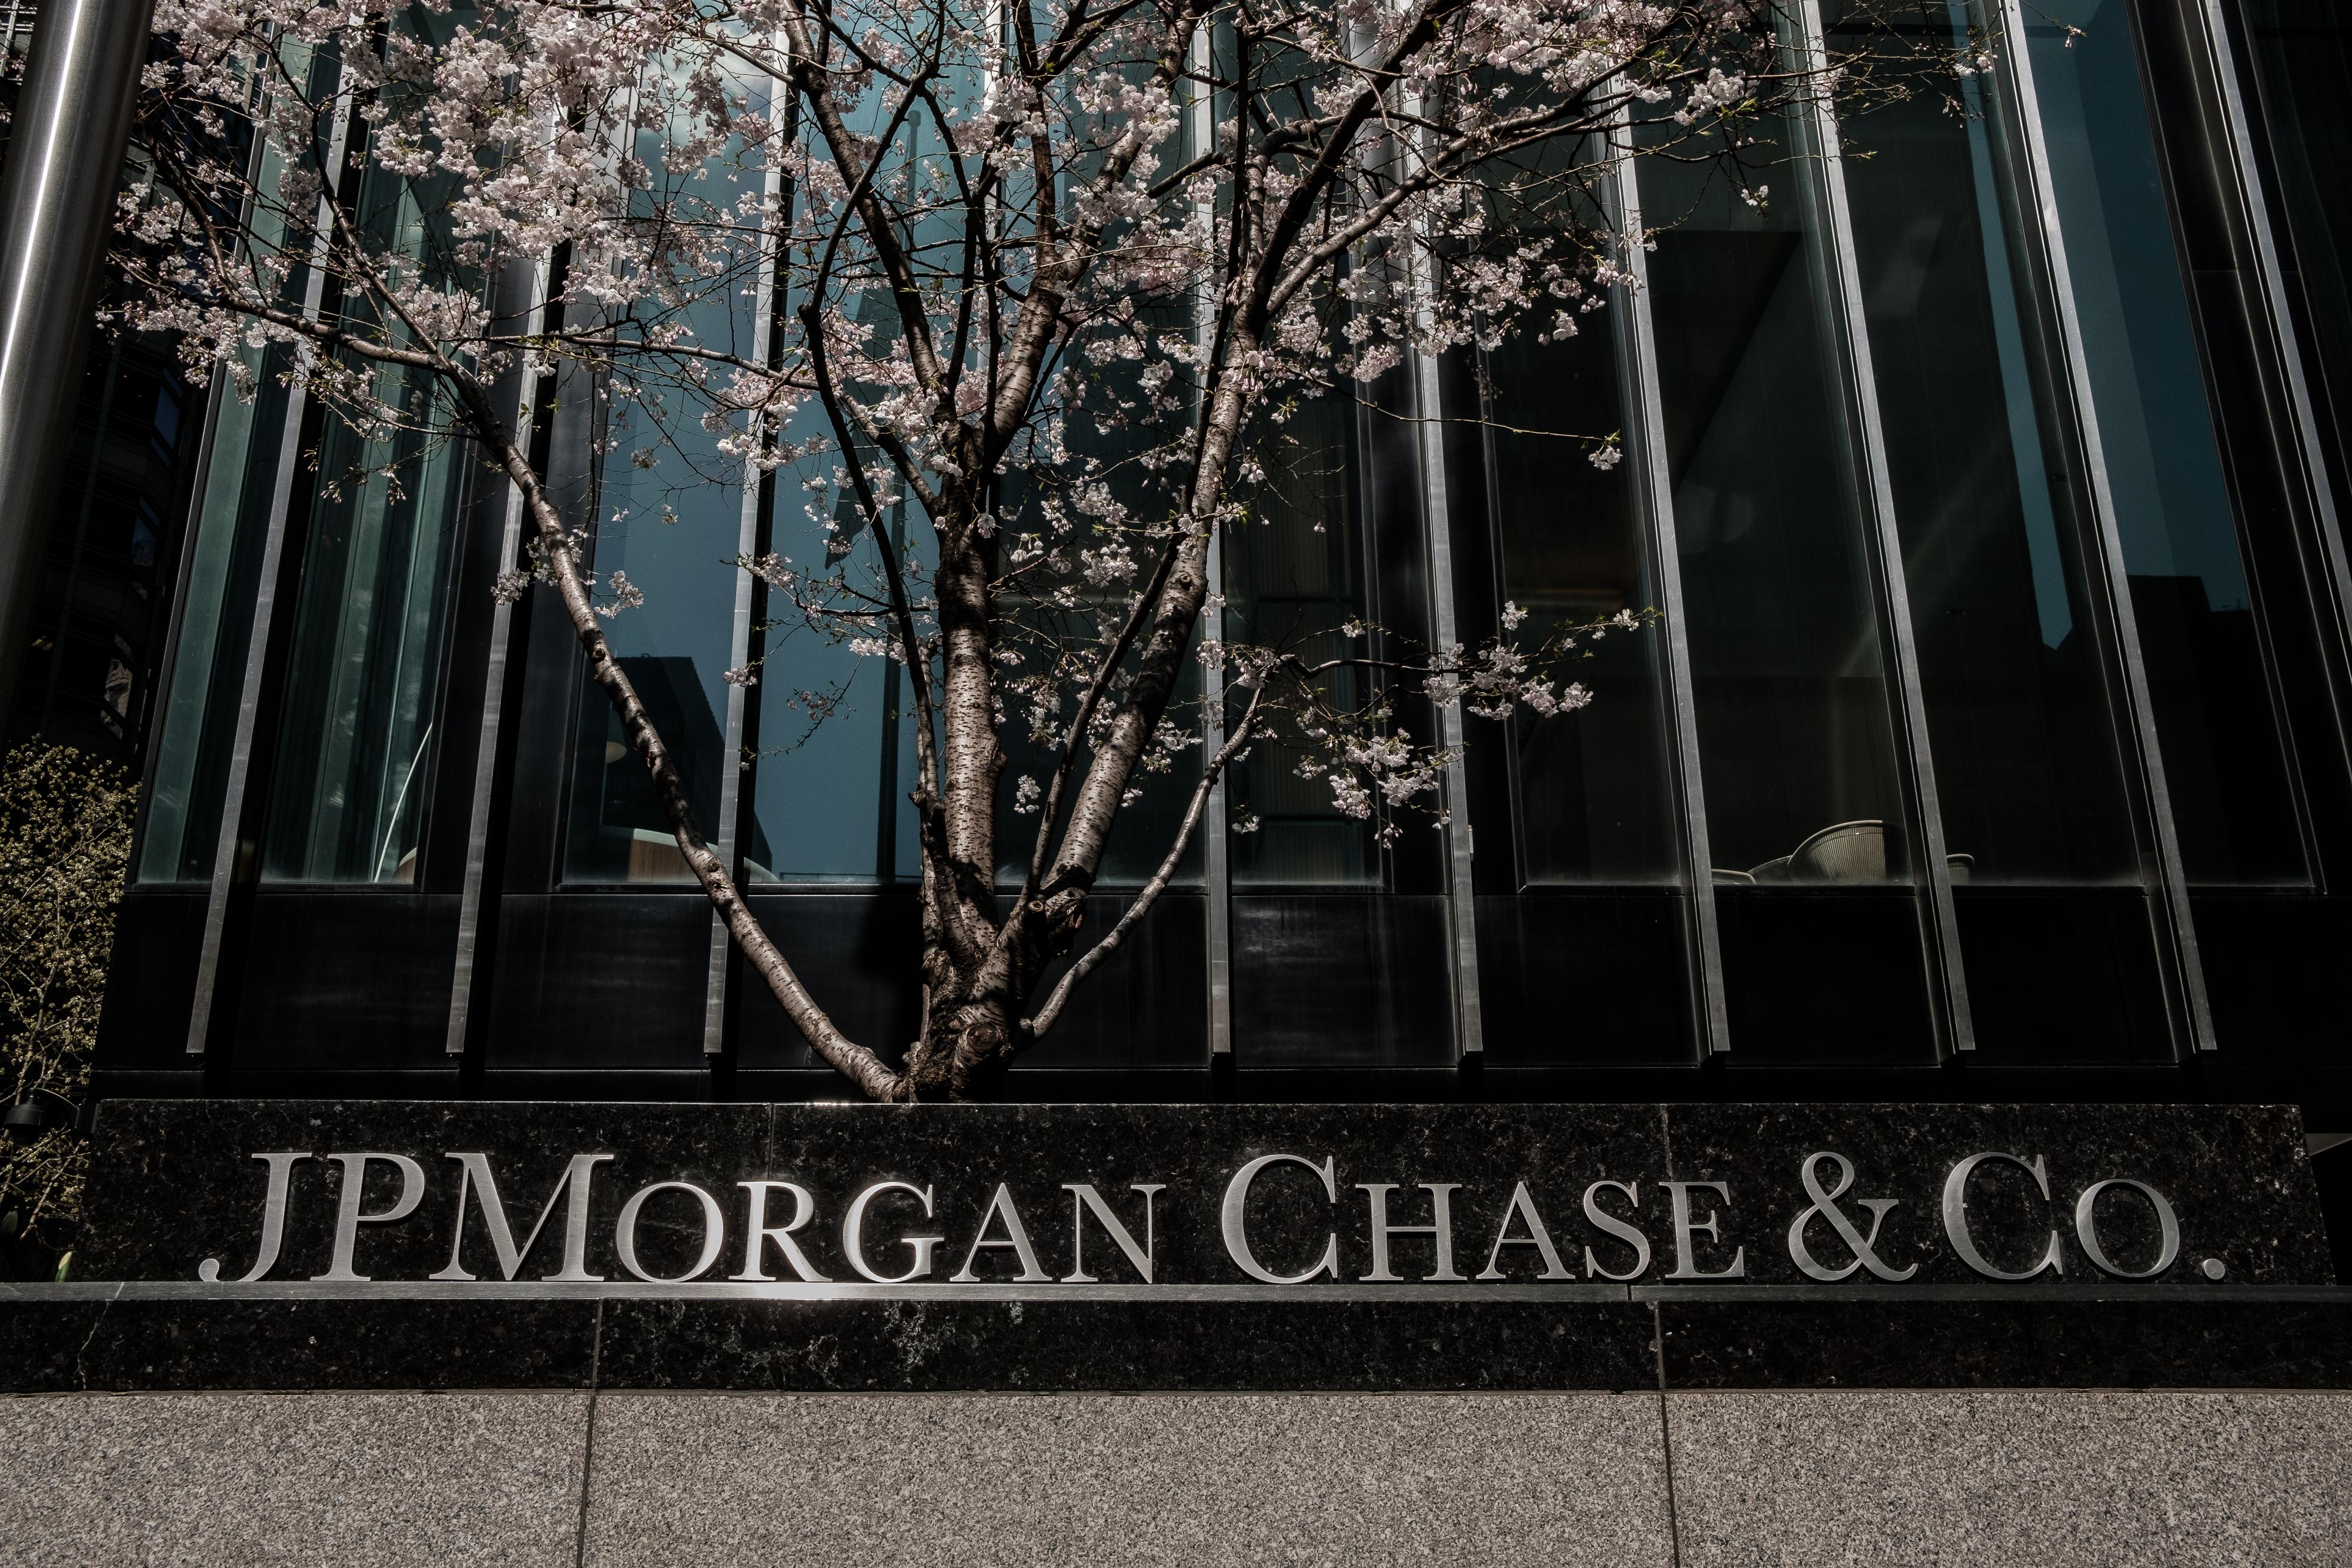 jpmorgan chase bitcoin blockchain cryptocurrency